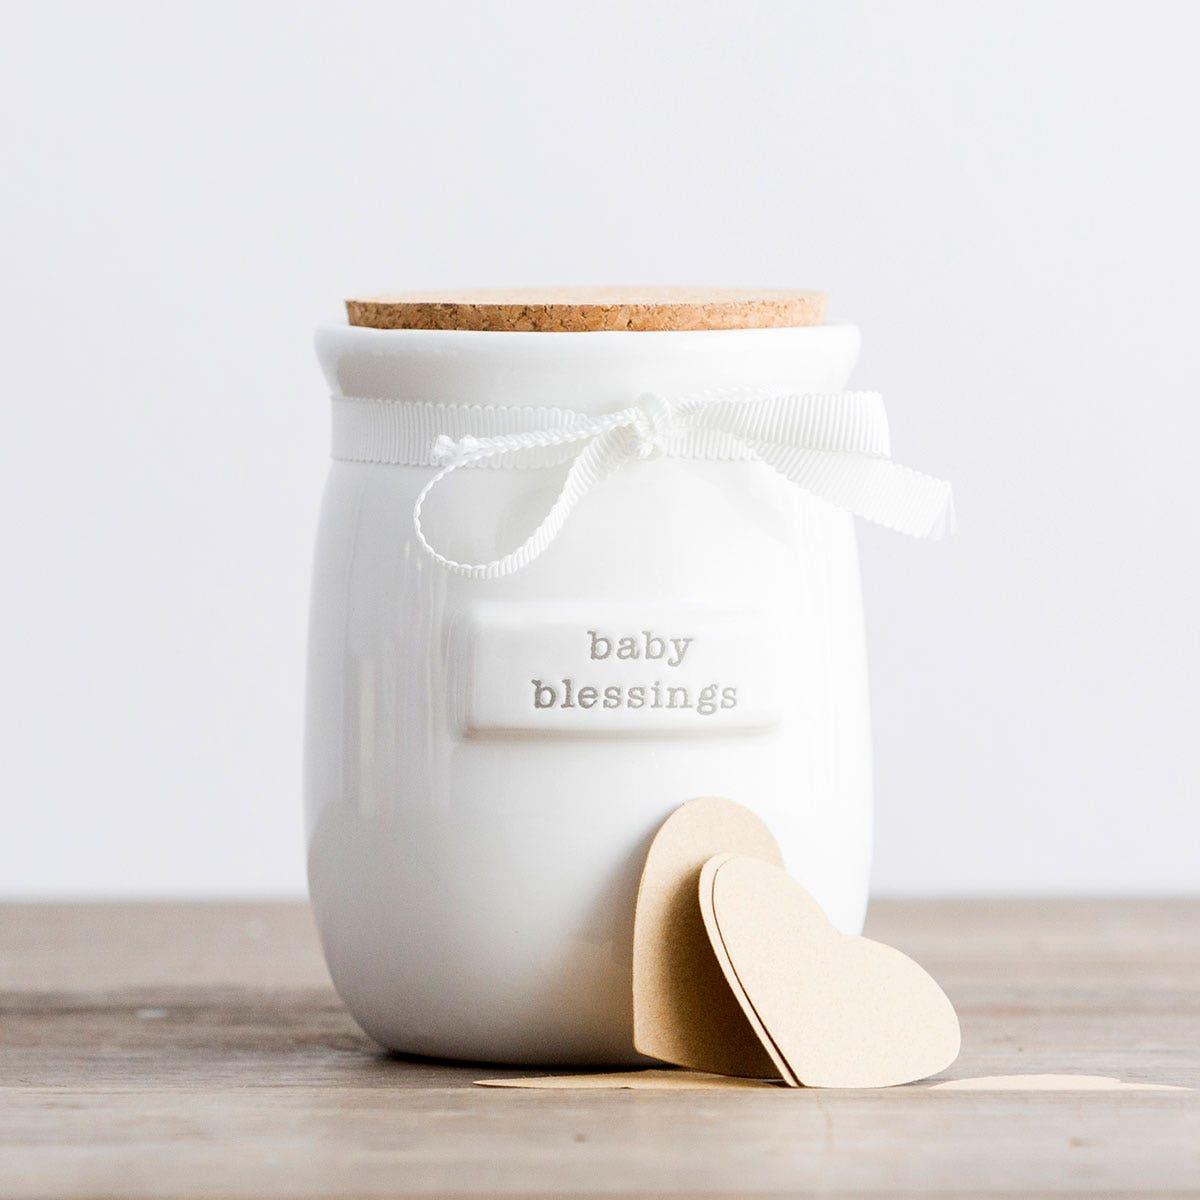 Baby Blessings - Ceramic Jar and Kraft Cards Gift Set